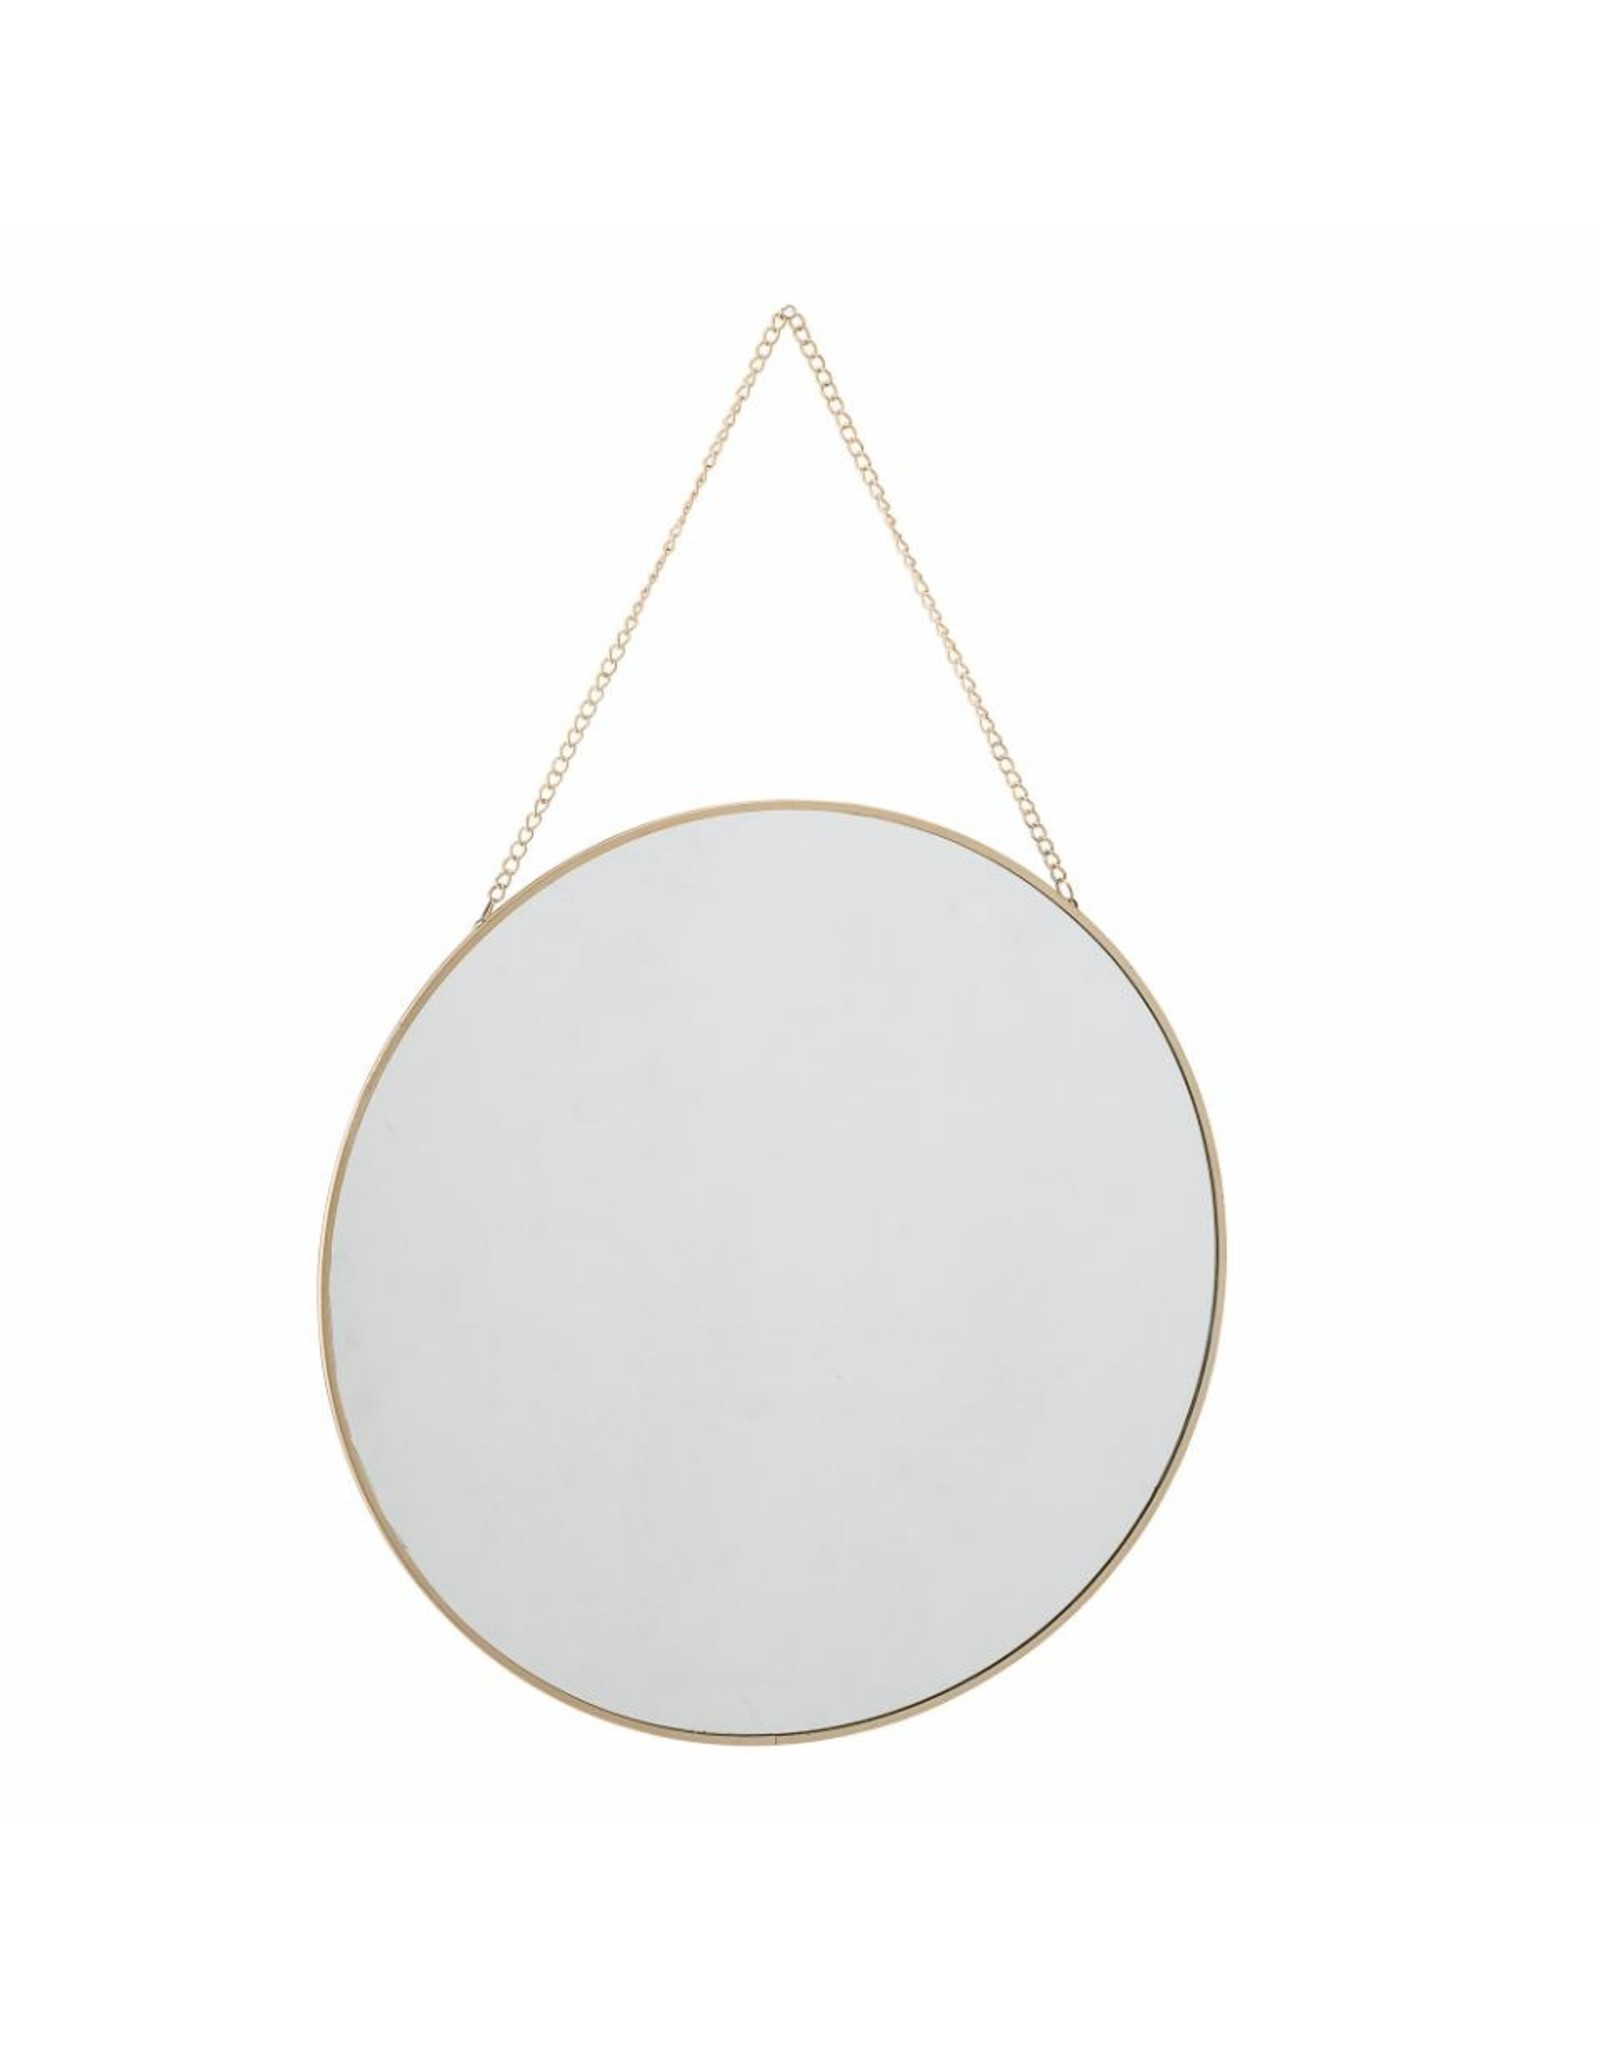 Spiegel goud ketting